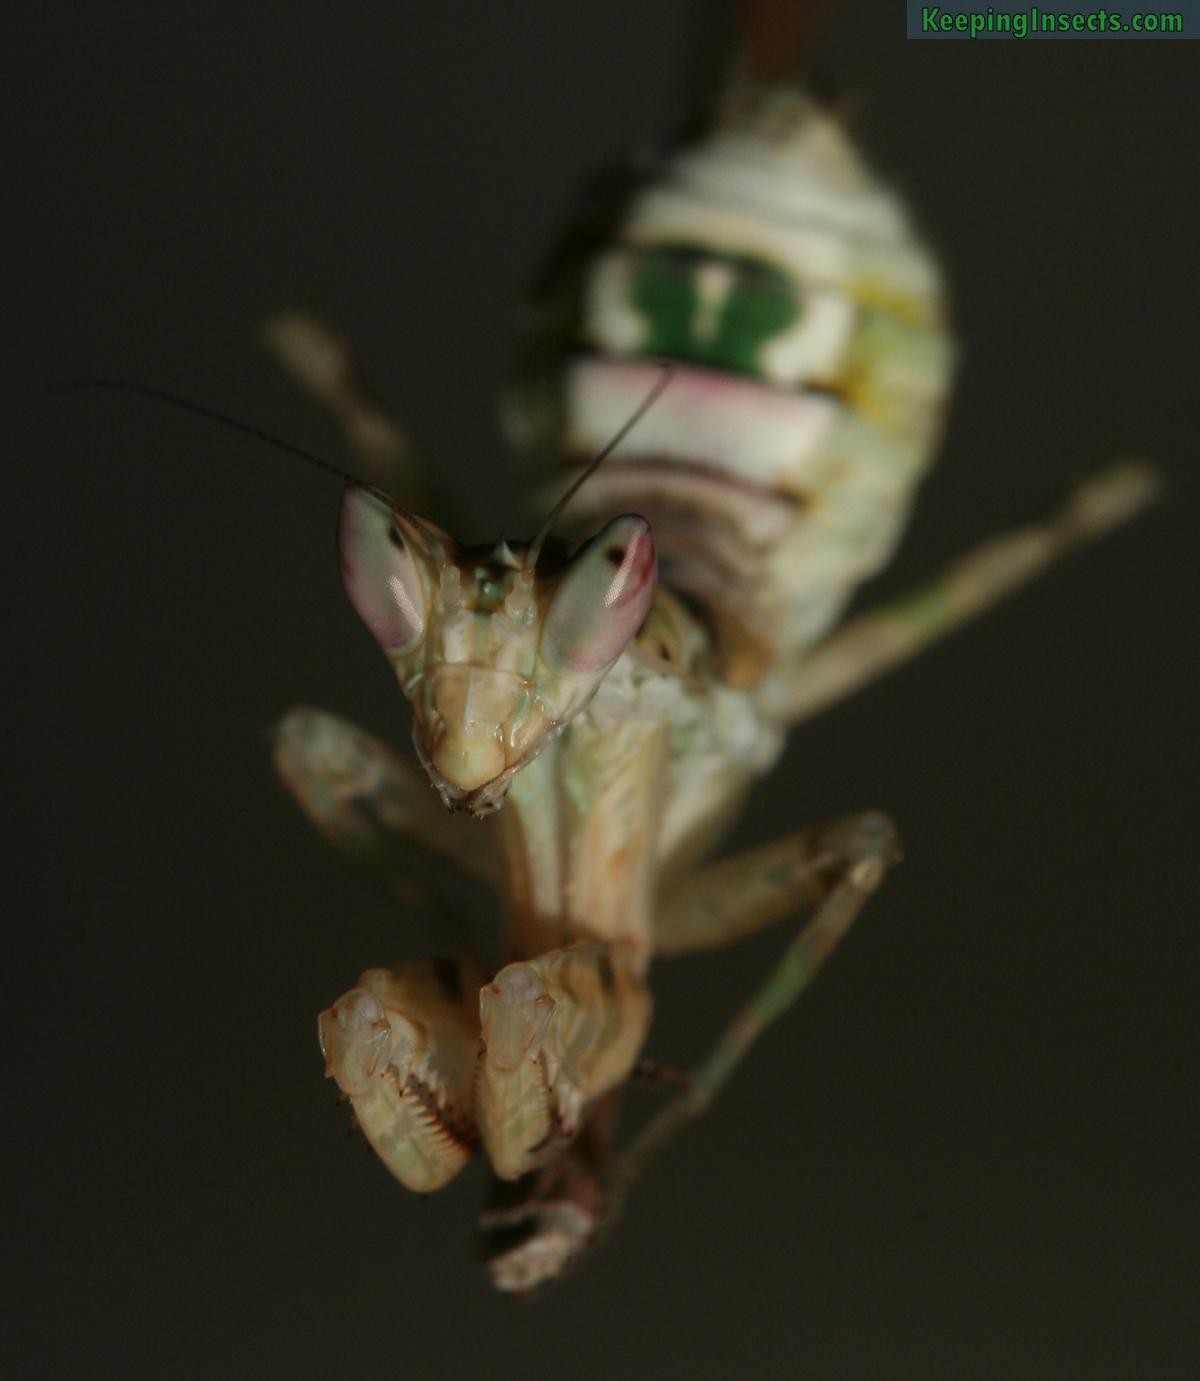 indian flower mantis nymph